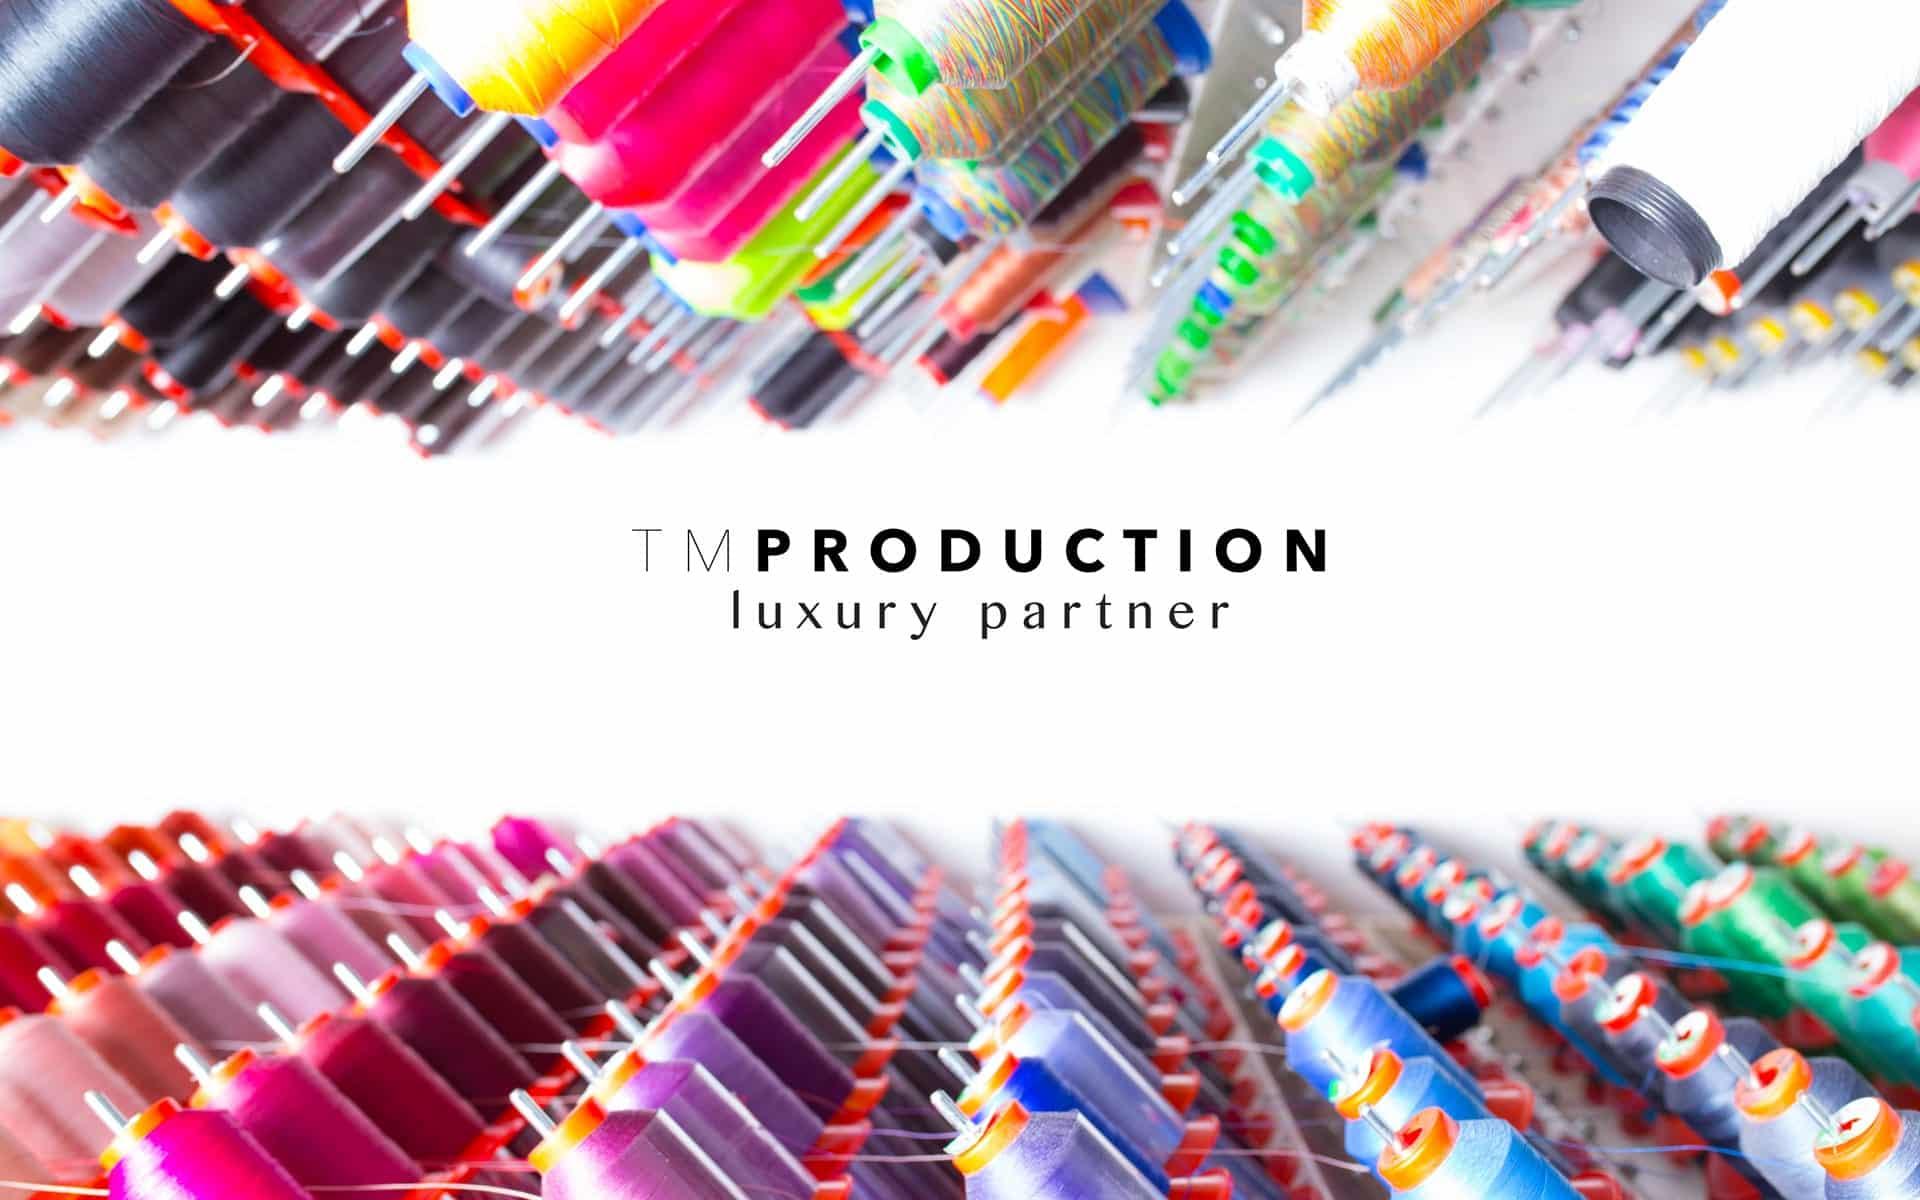 slide 1 production